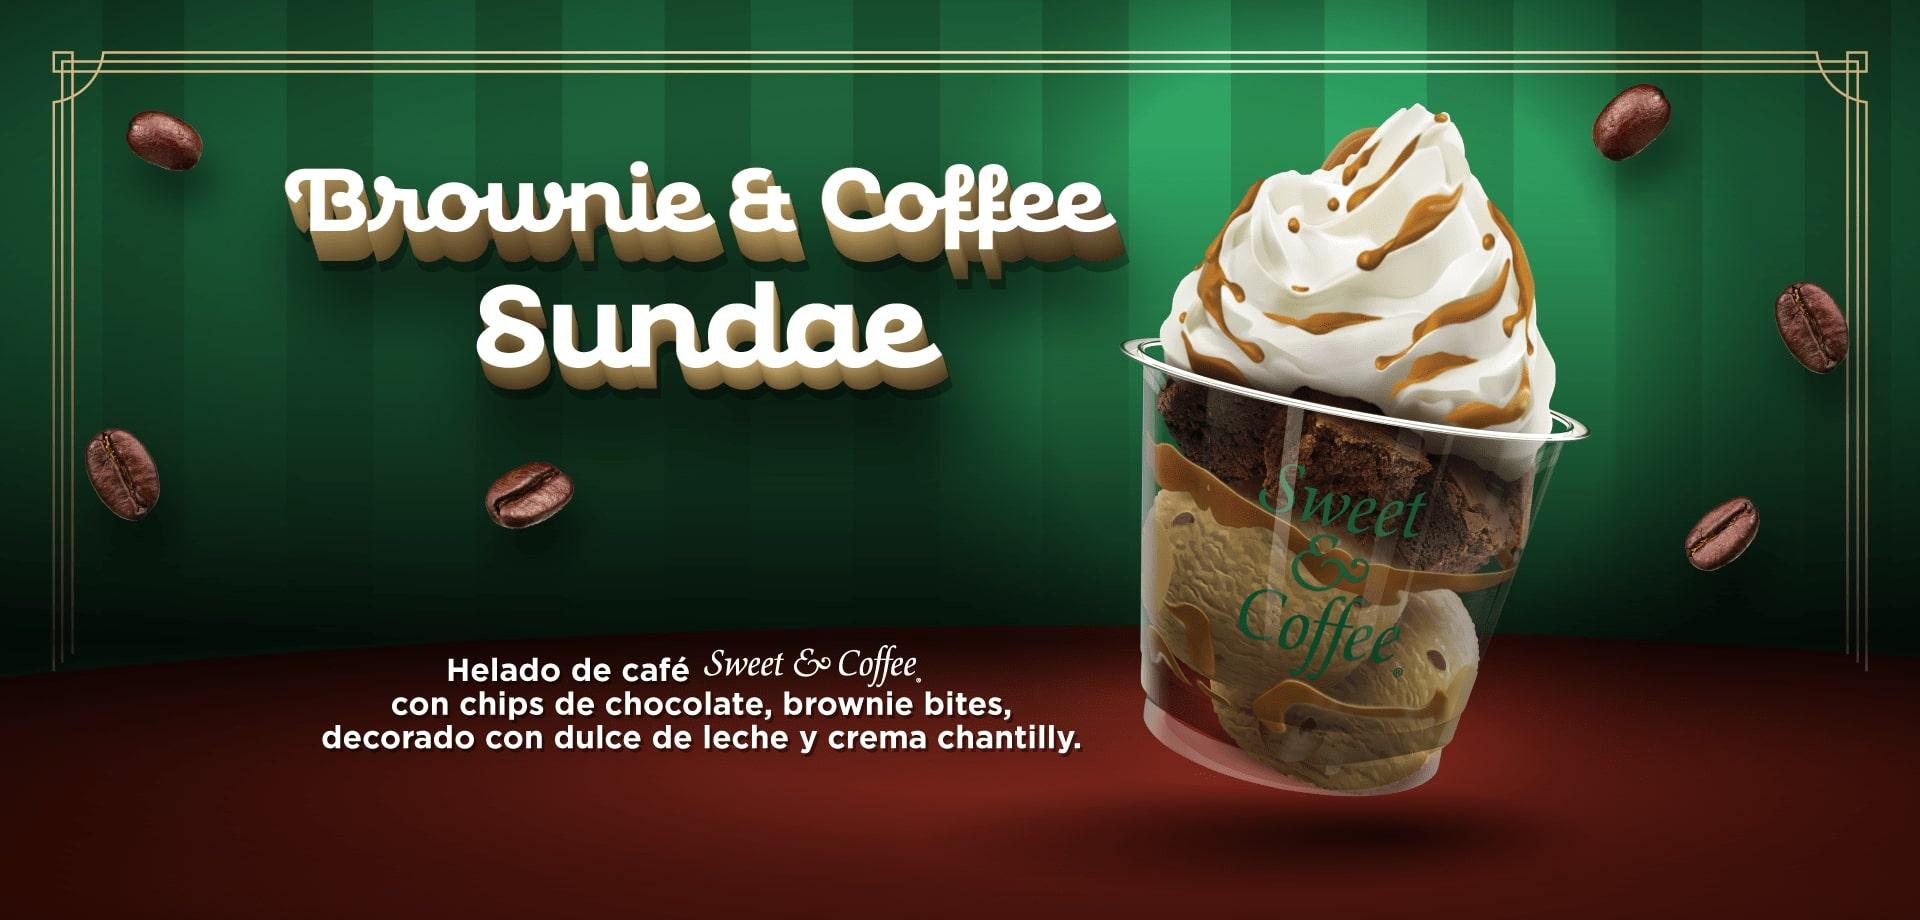 Brownie Coffee Sundae